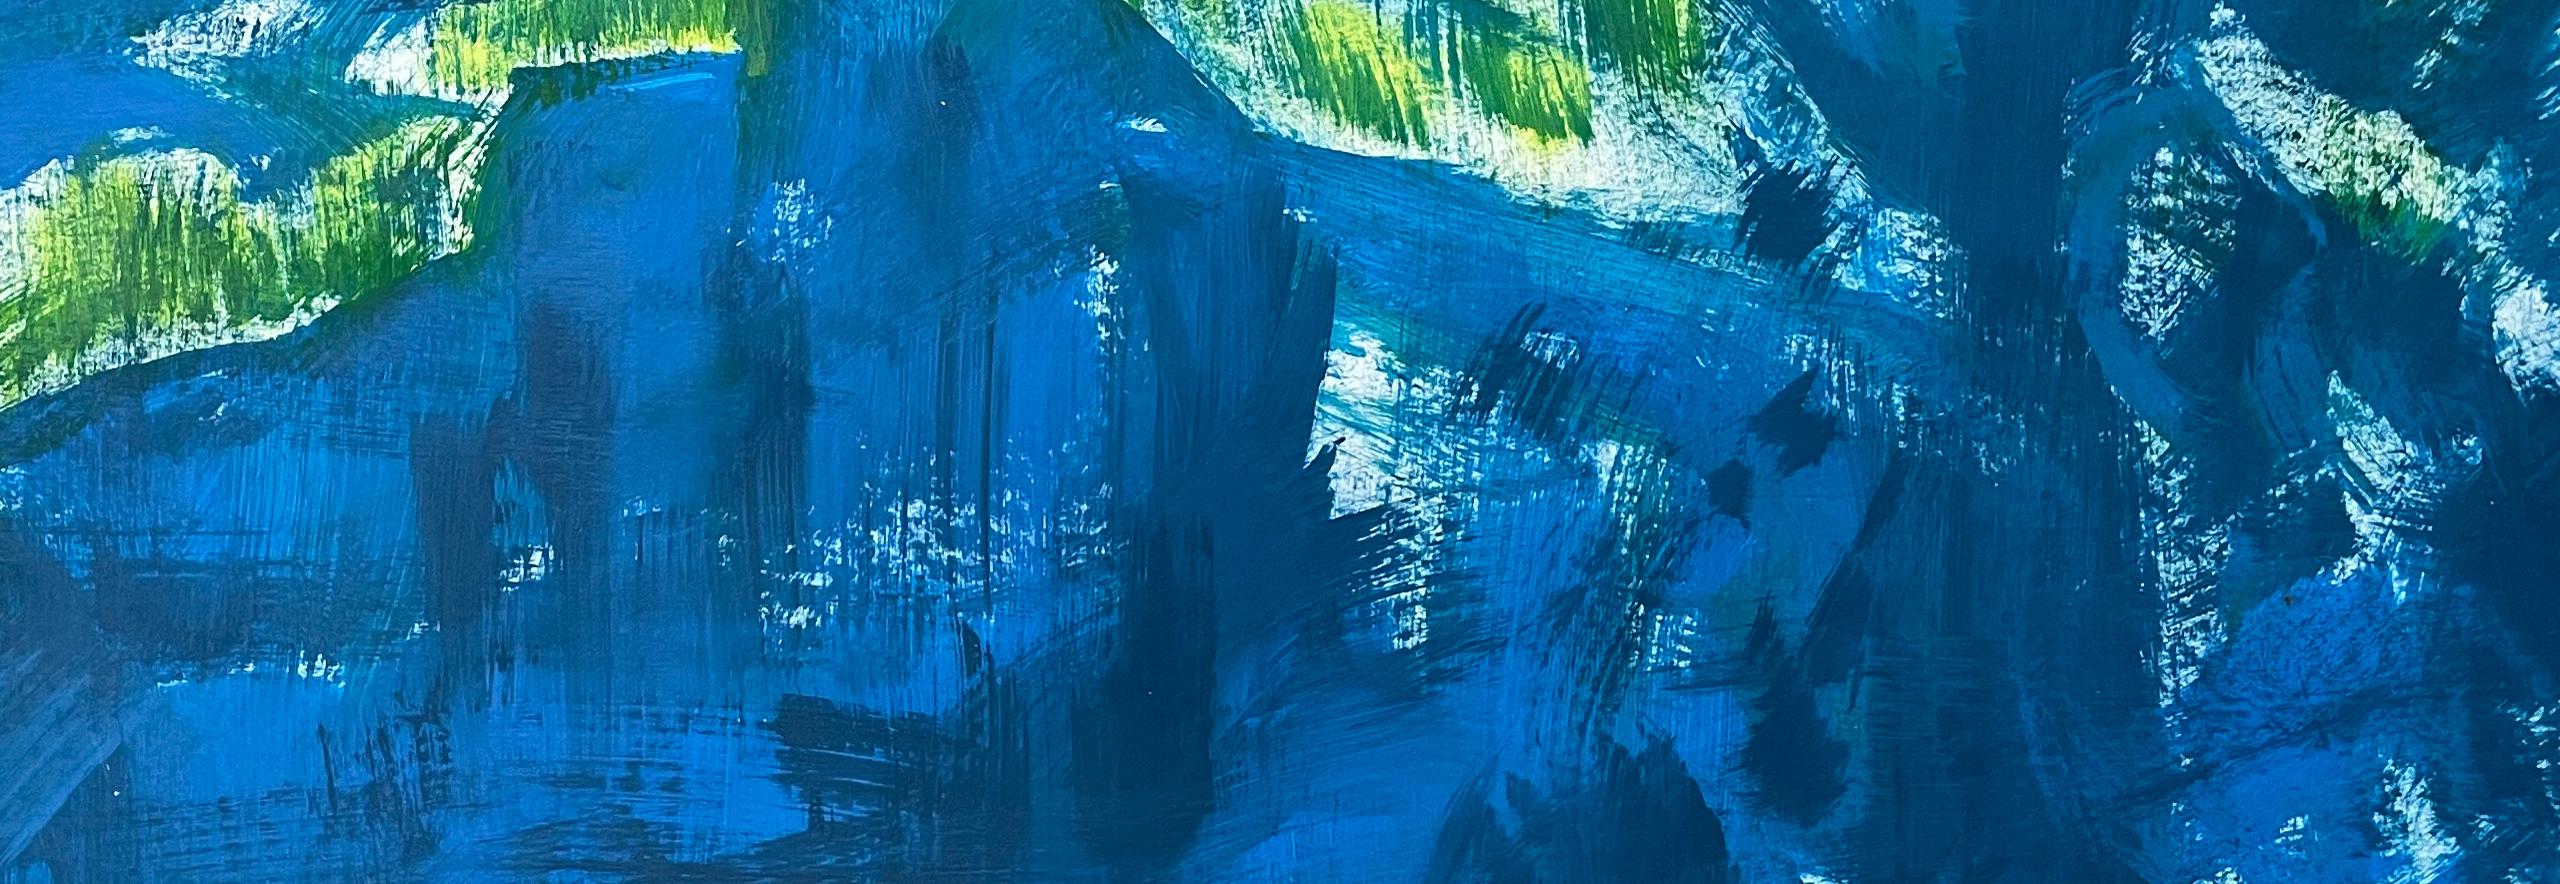 "Abstrakt / abstract Sylvia Gatz. ""Ohne Titel (Blue Jungle)"". Detail. 100 x 70 cm. Acryl auf Papier. 2017"